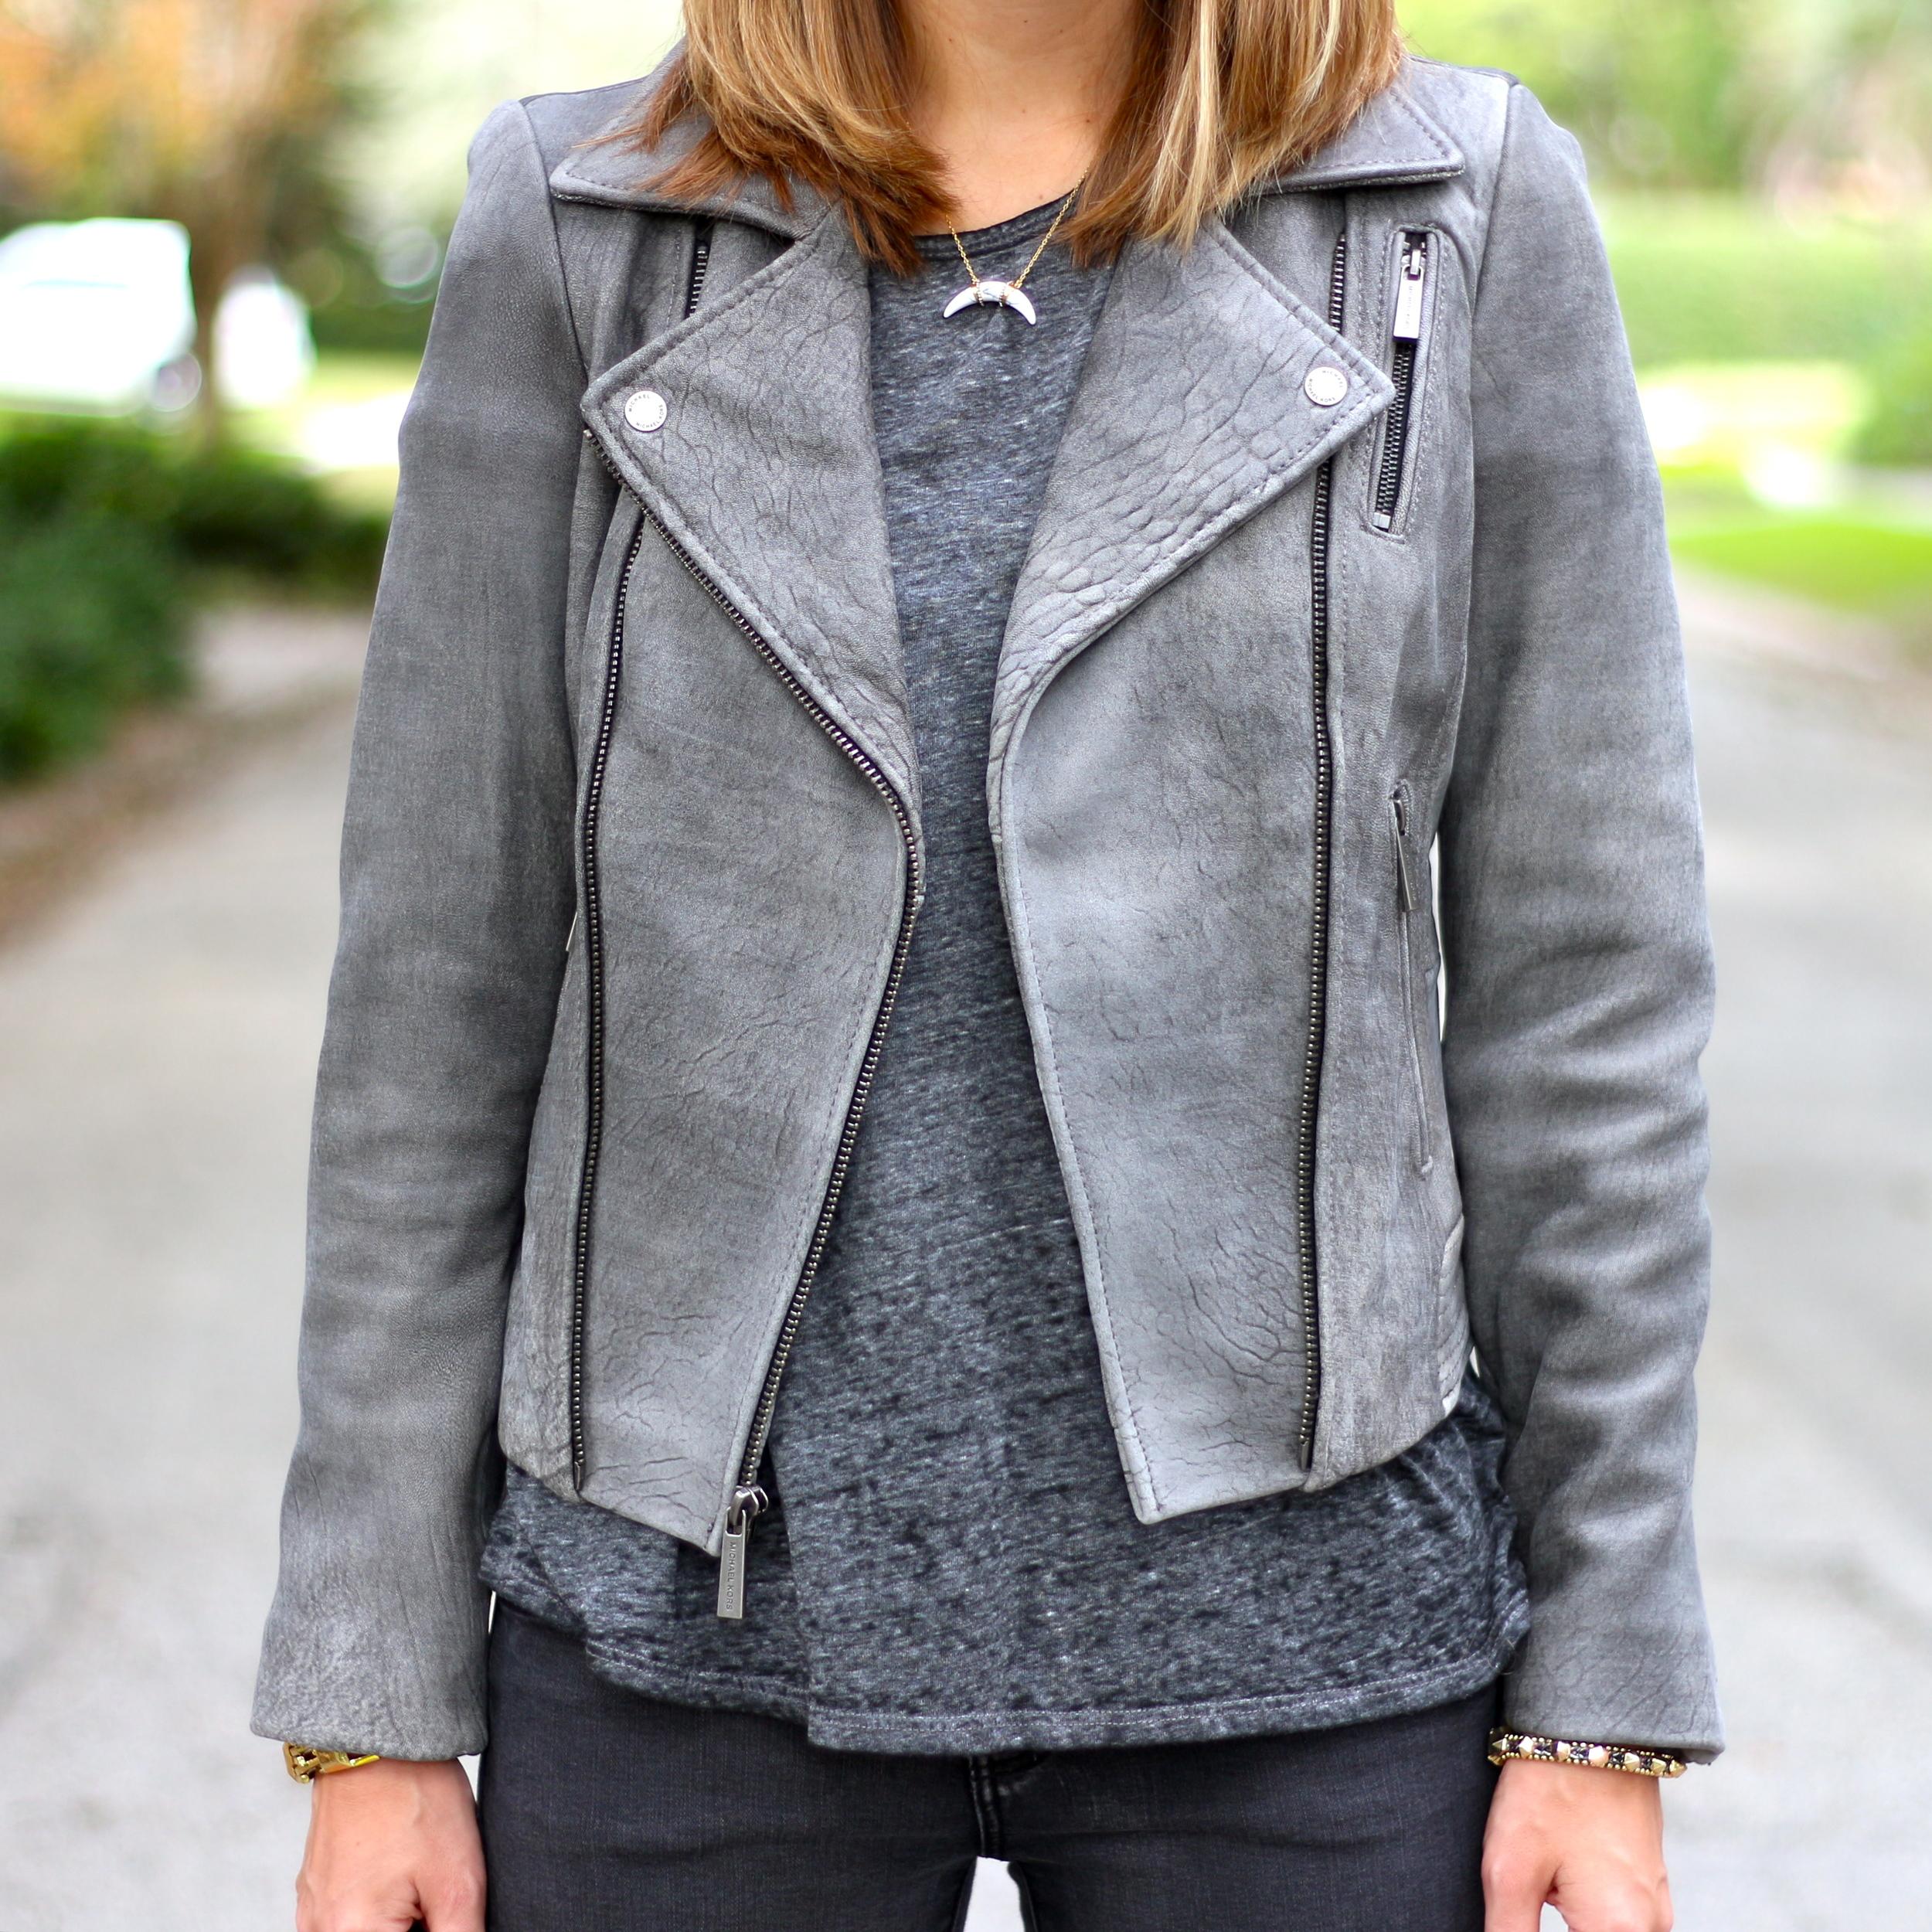 Gray leather jacket, gray tee